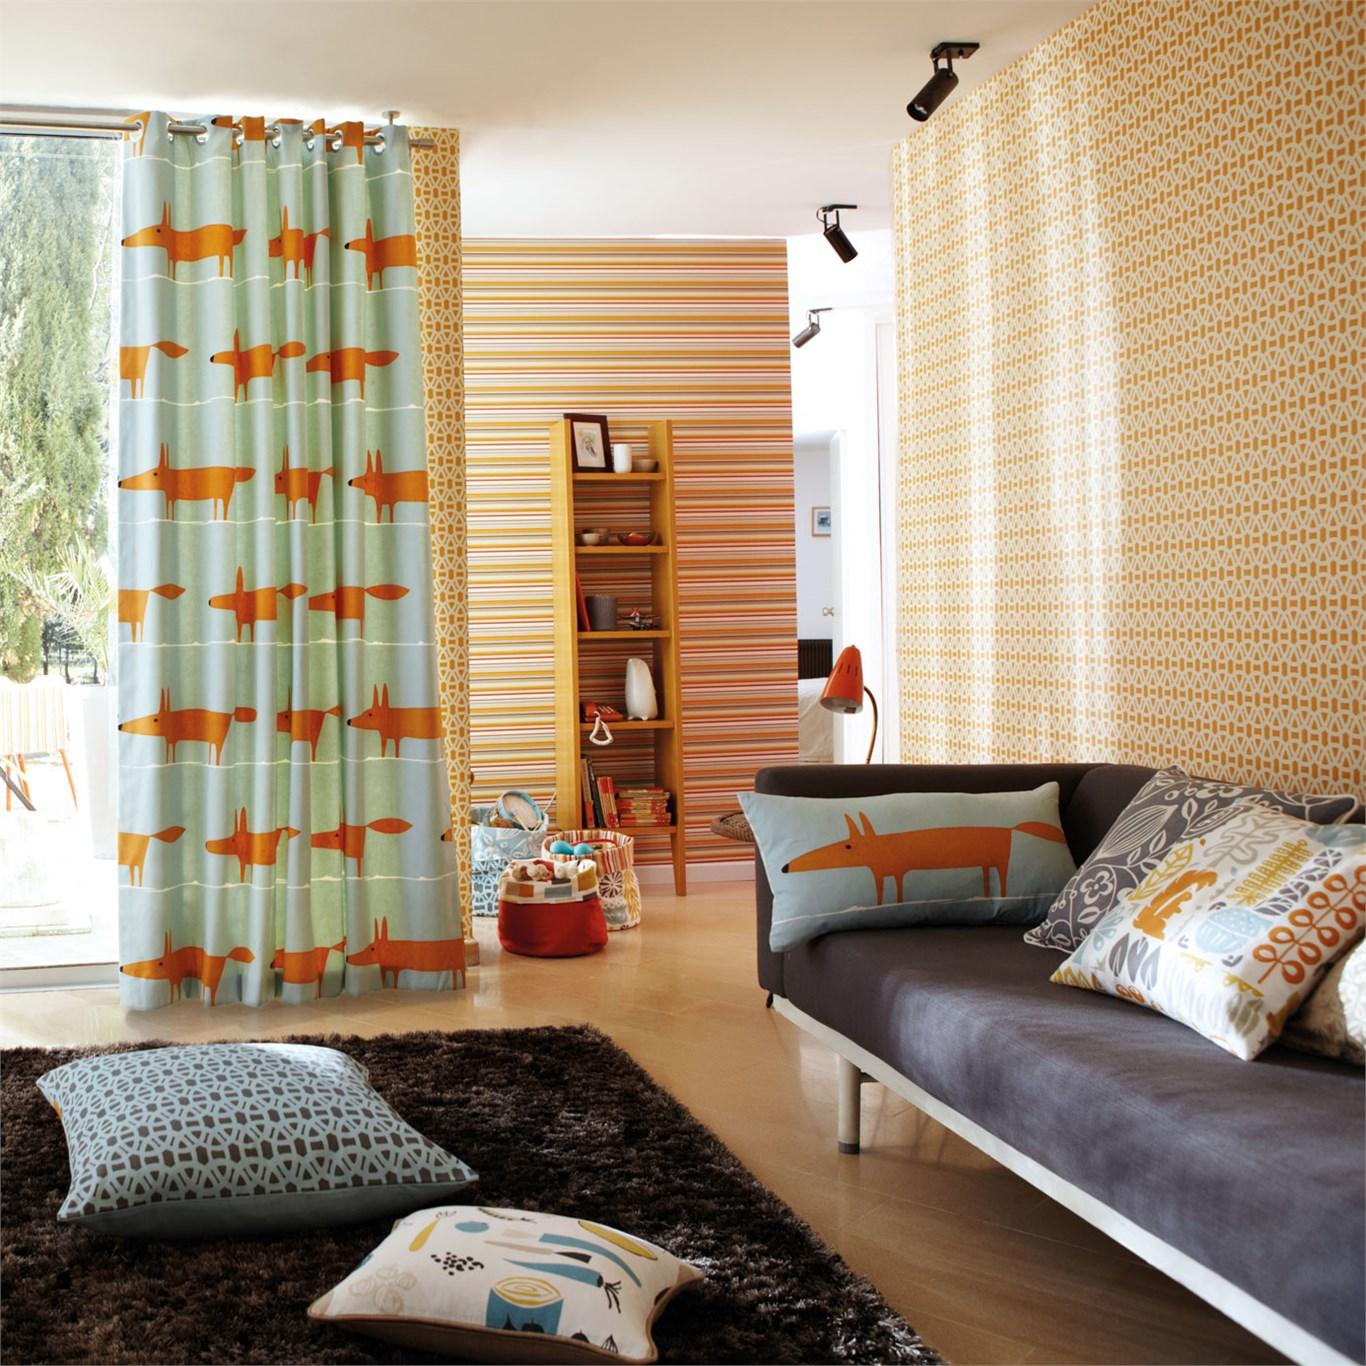 wallpapers scion fashion - photo #9